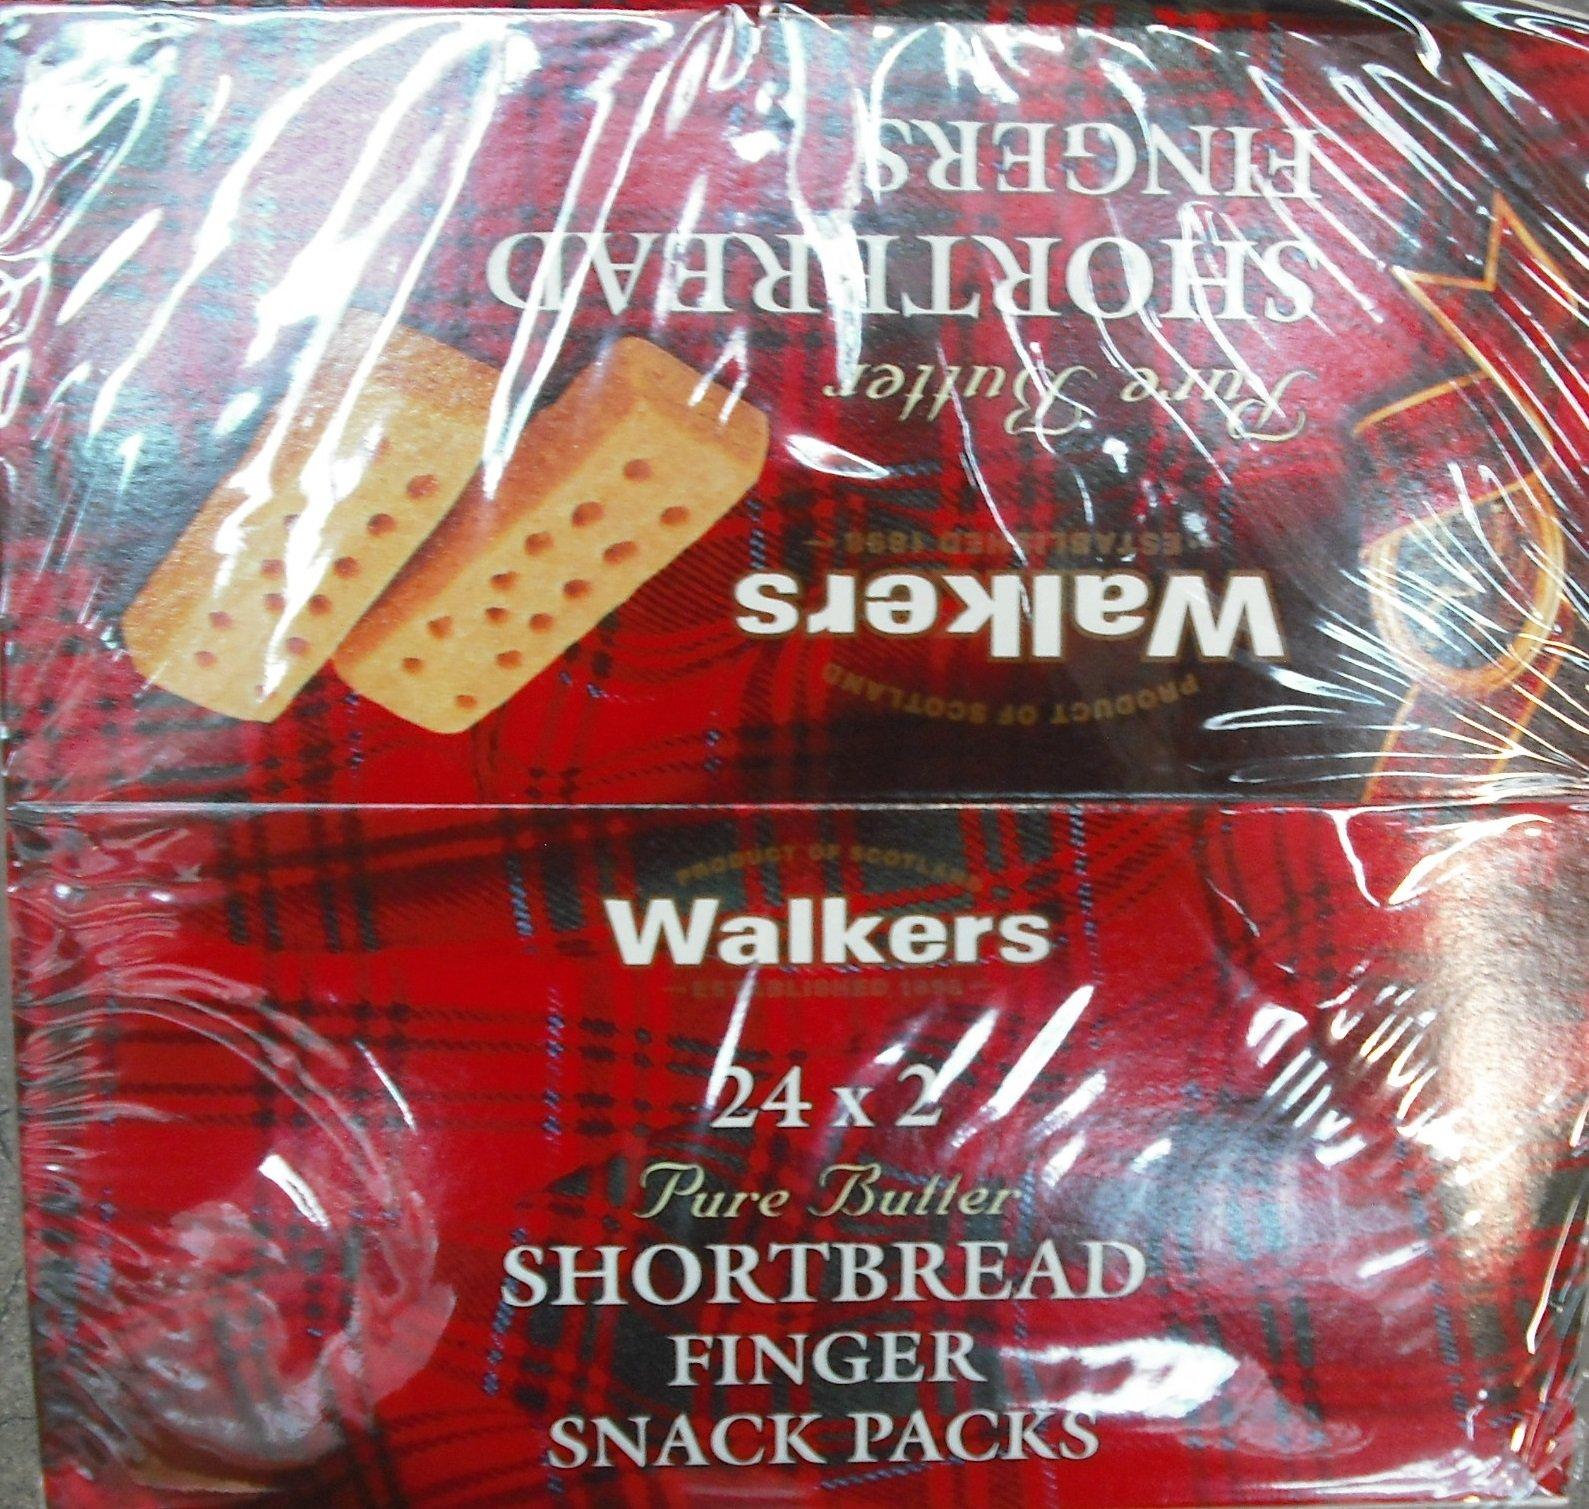 Walkers Fingers Shortbread 3 x 24s